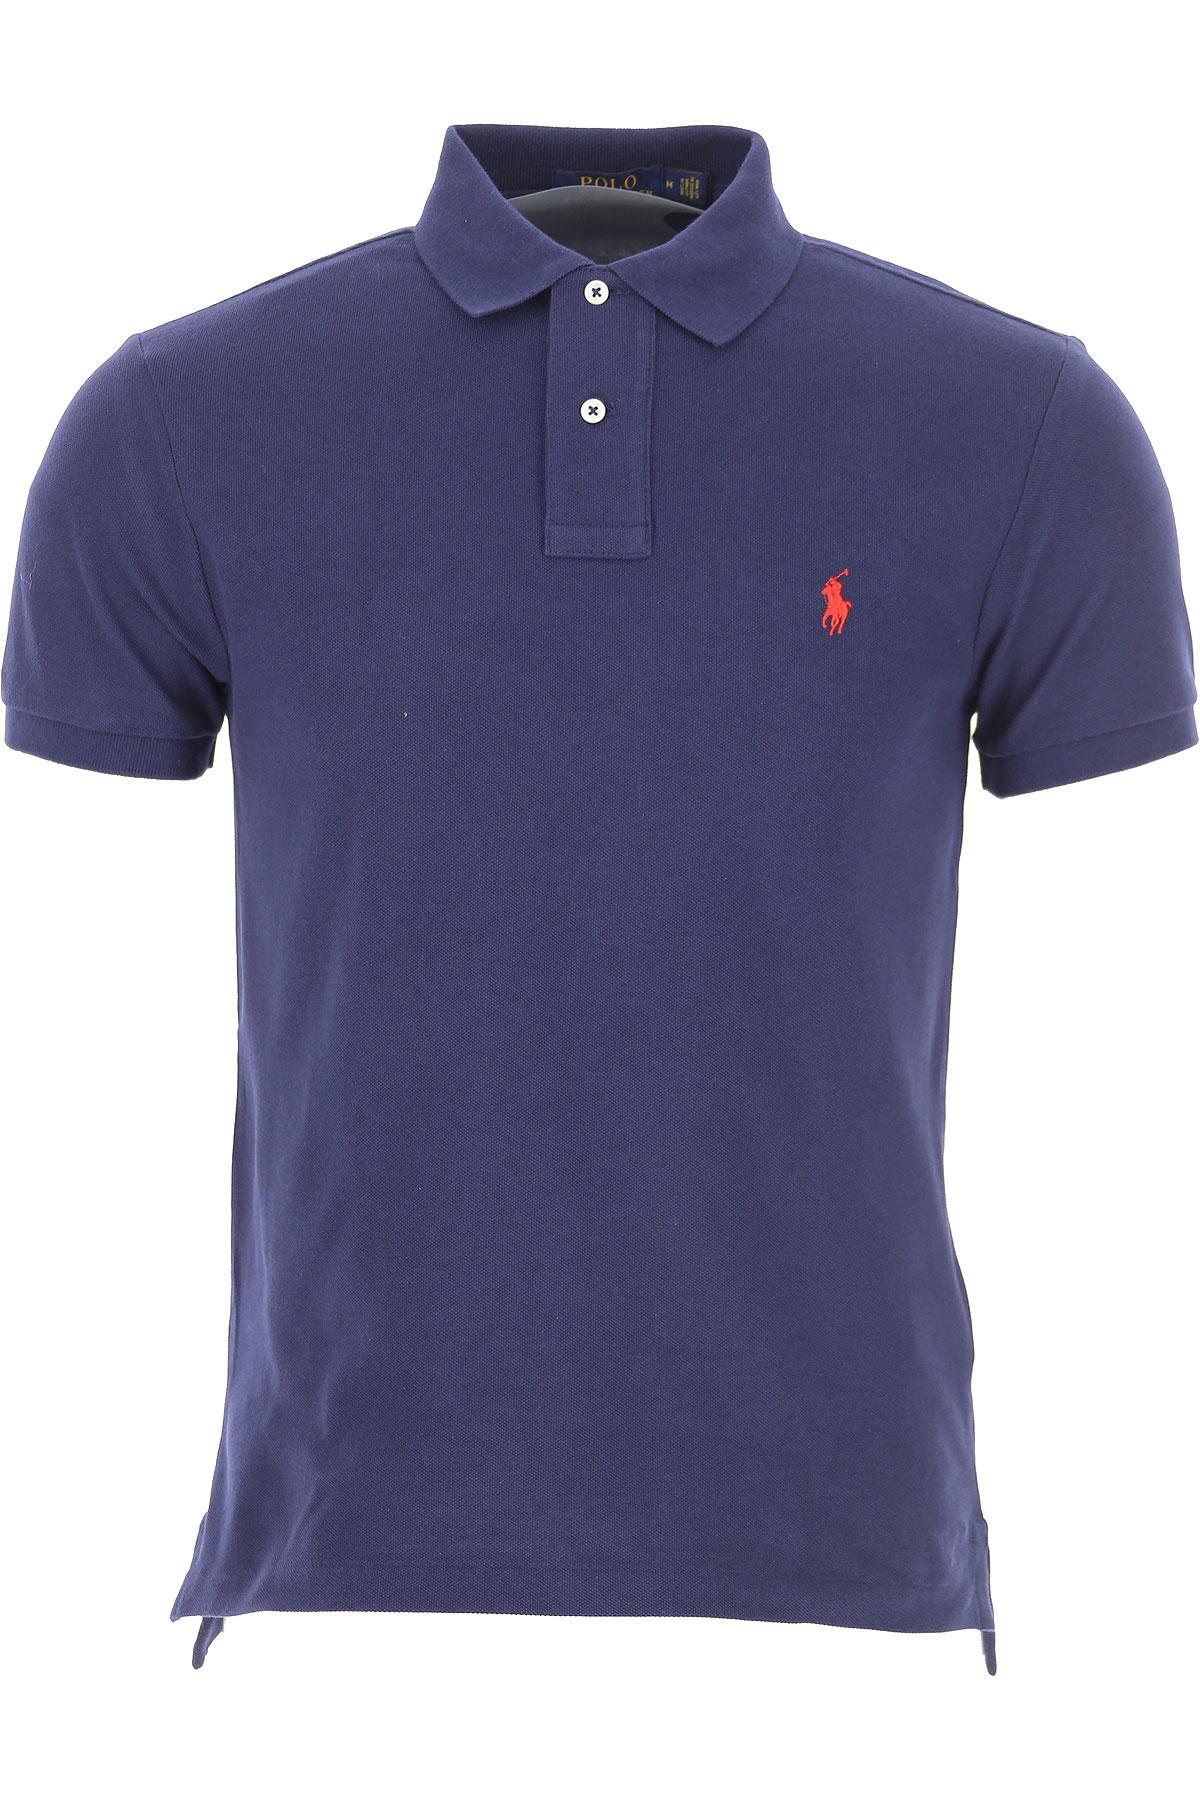 Ralph Lauren Ralph Lauren Polo Shirt for Men On Sale, Navy Blue, Cotton, 2021, L S XXL from Raffaello Network | Accuweather